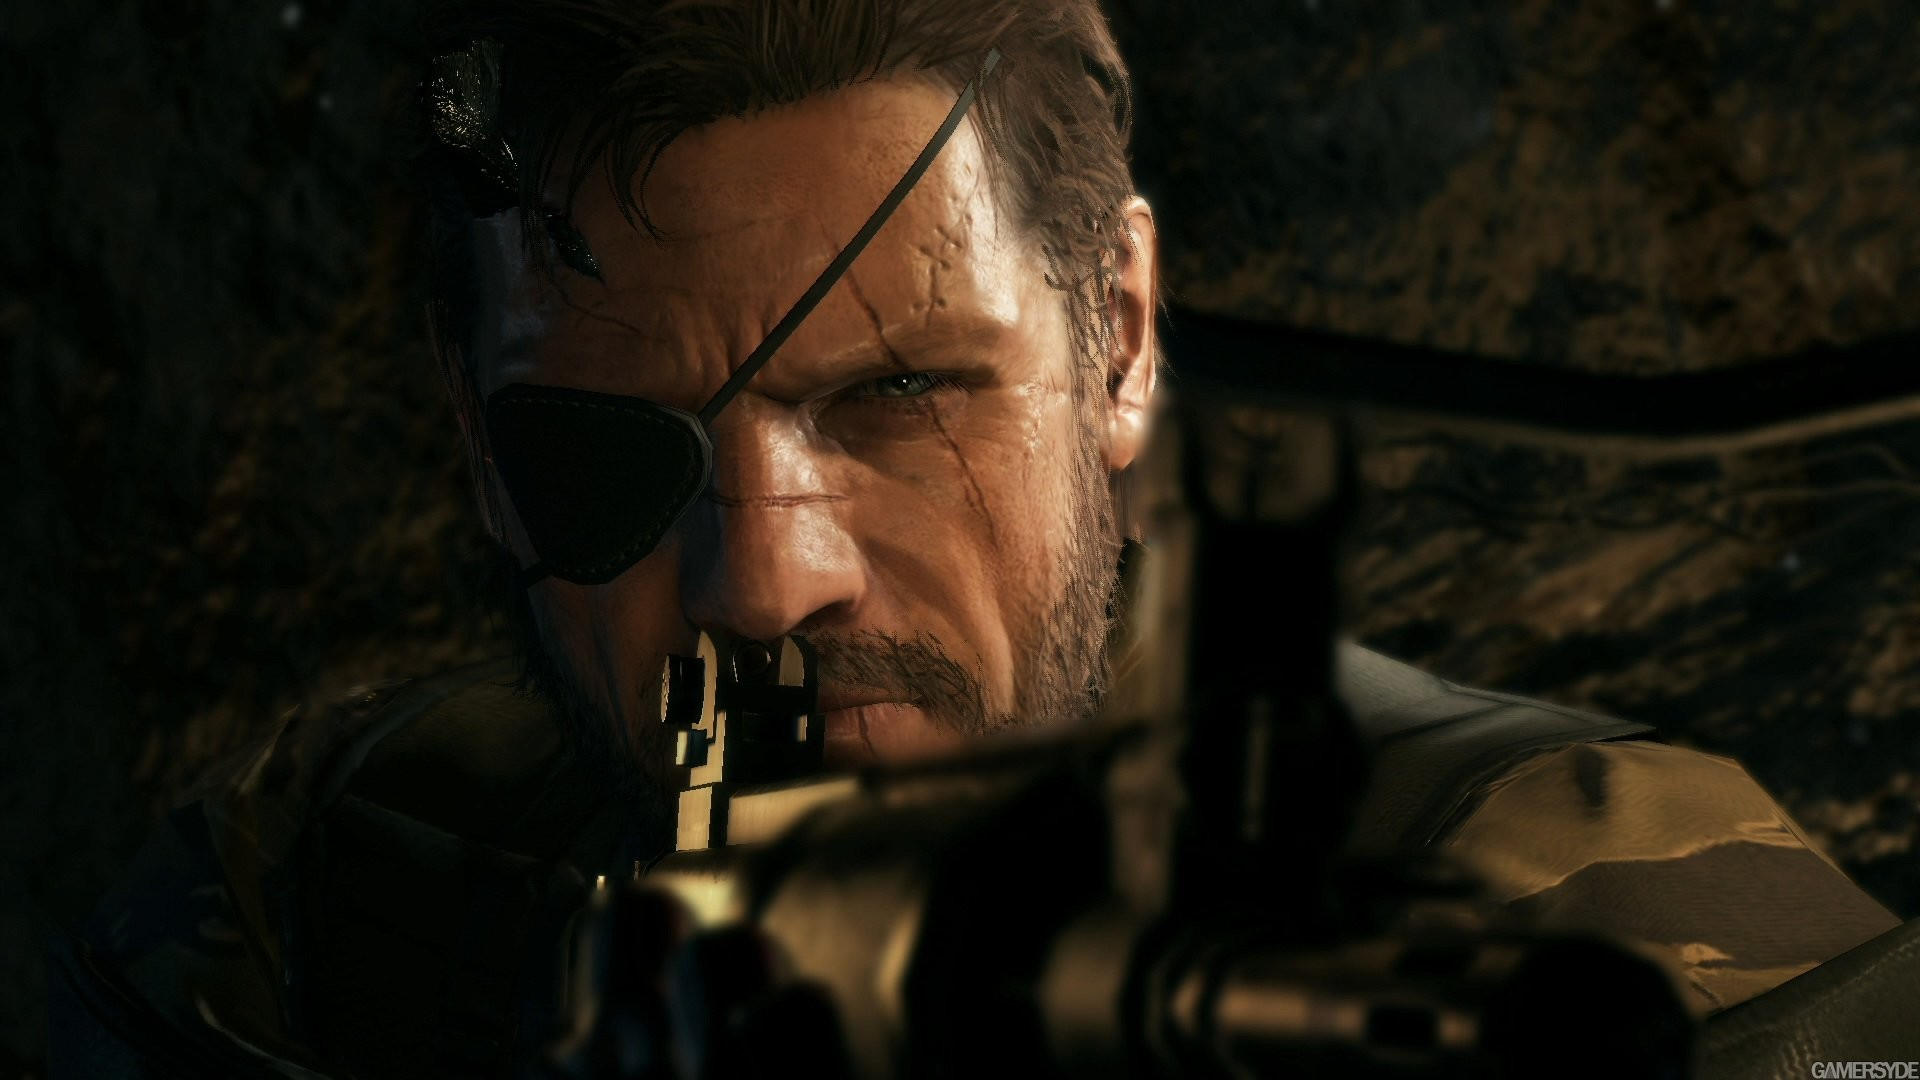 Community Review: Metal Gear Solid V: The Phantom Pain